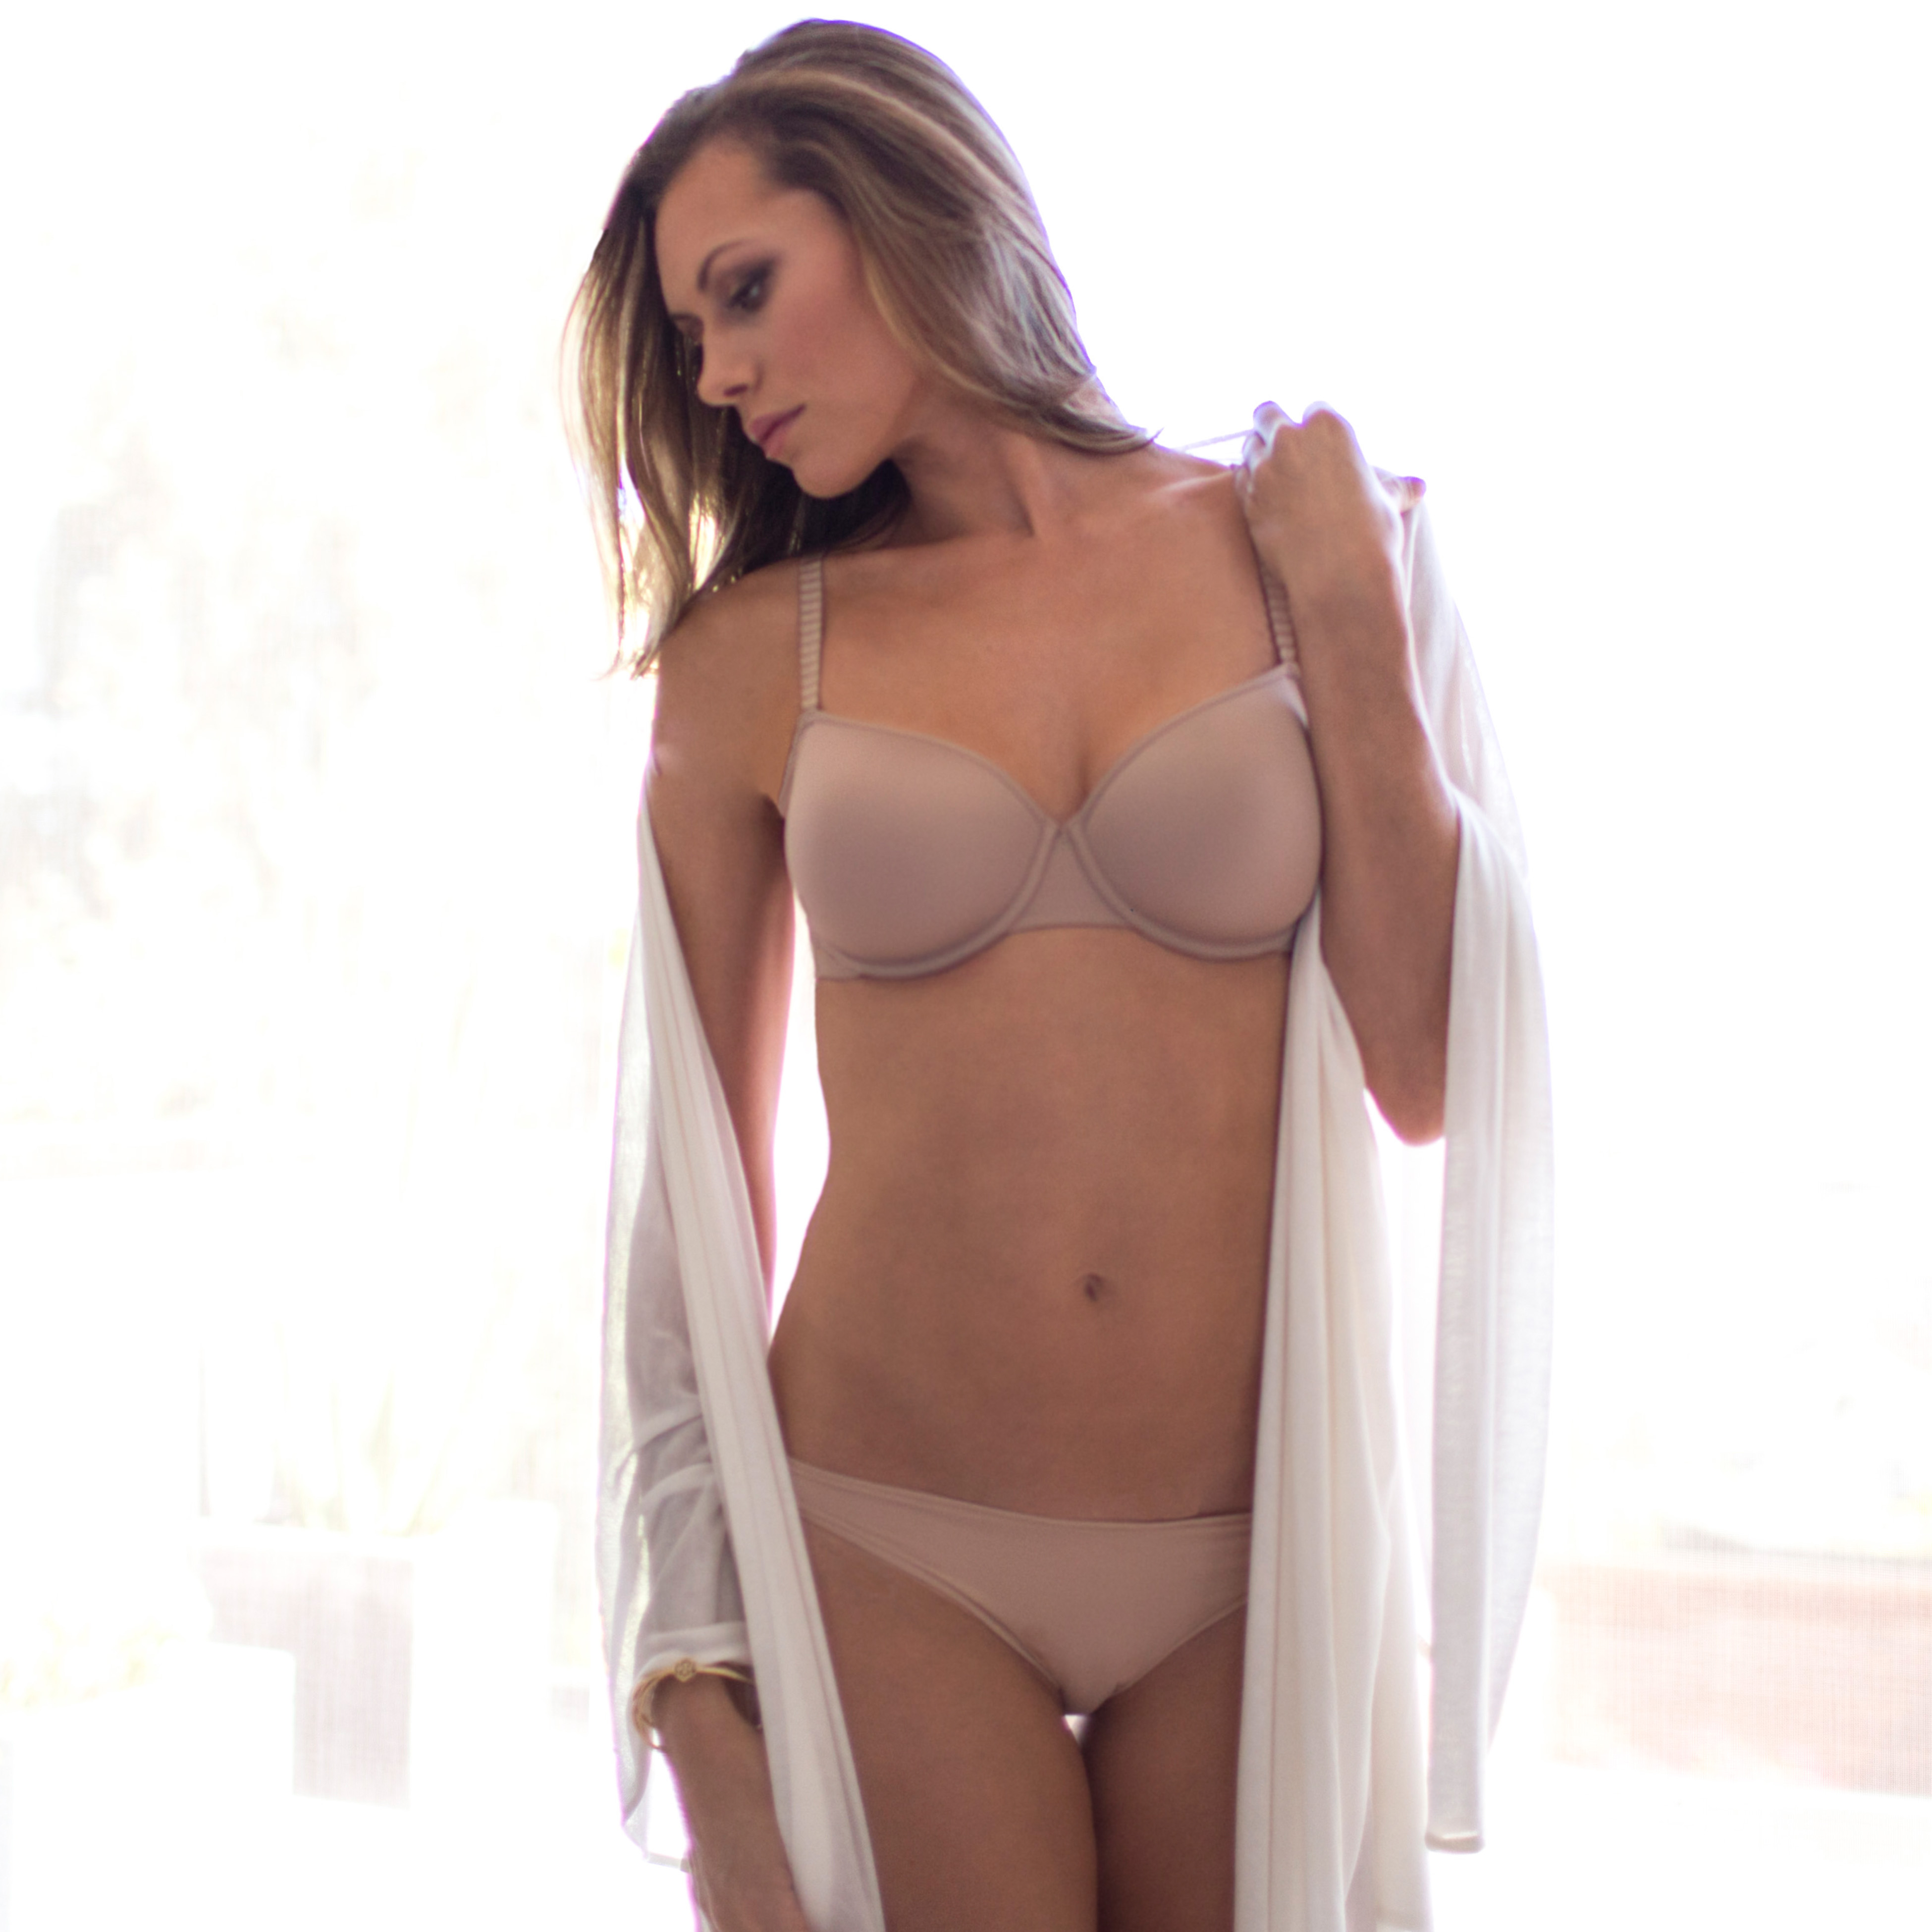 Tee shirt bra in Nude Lifestyle